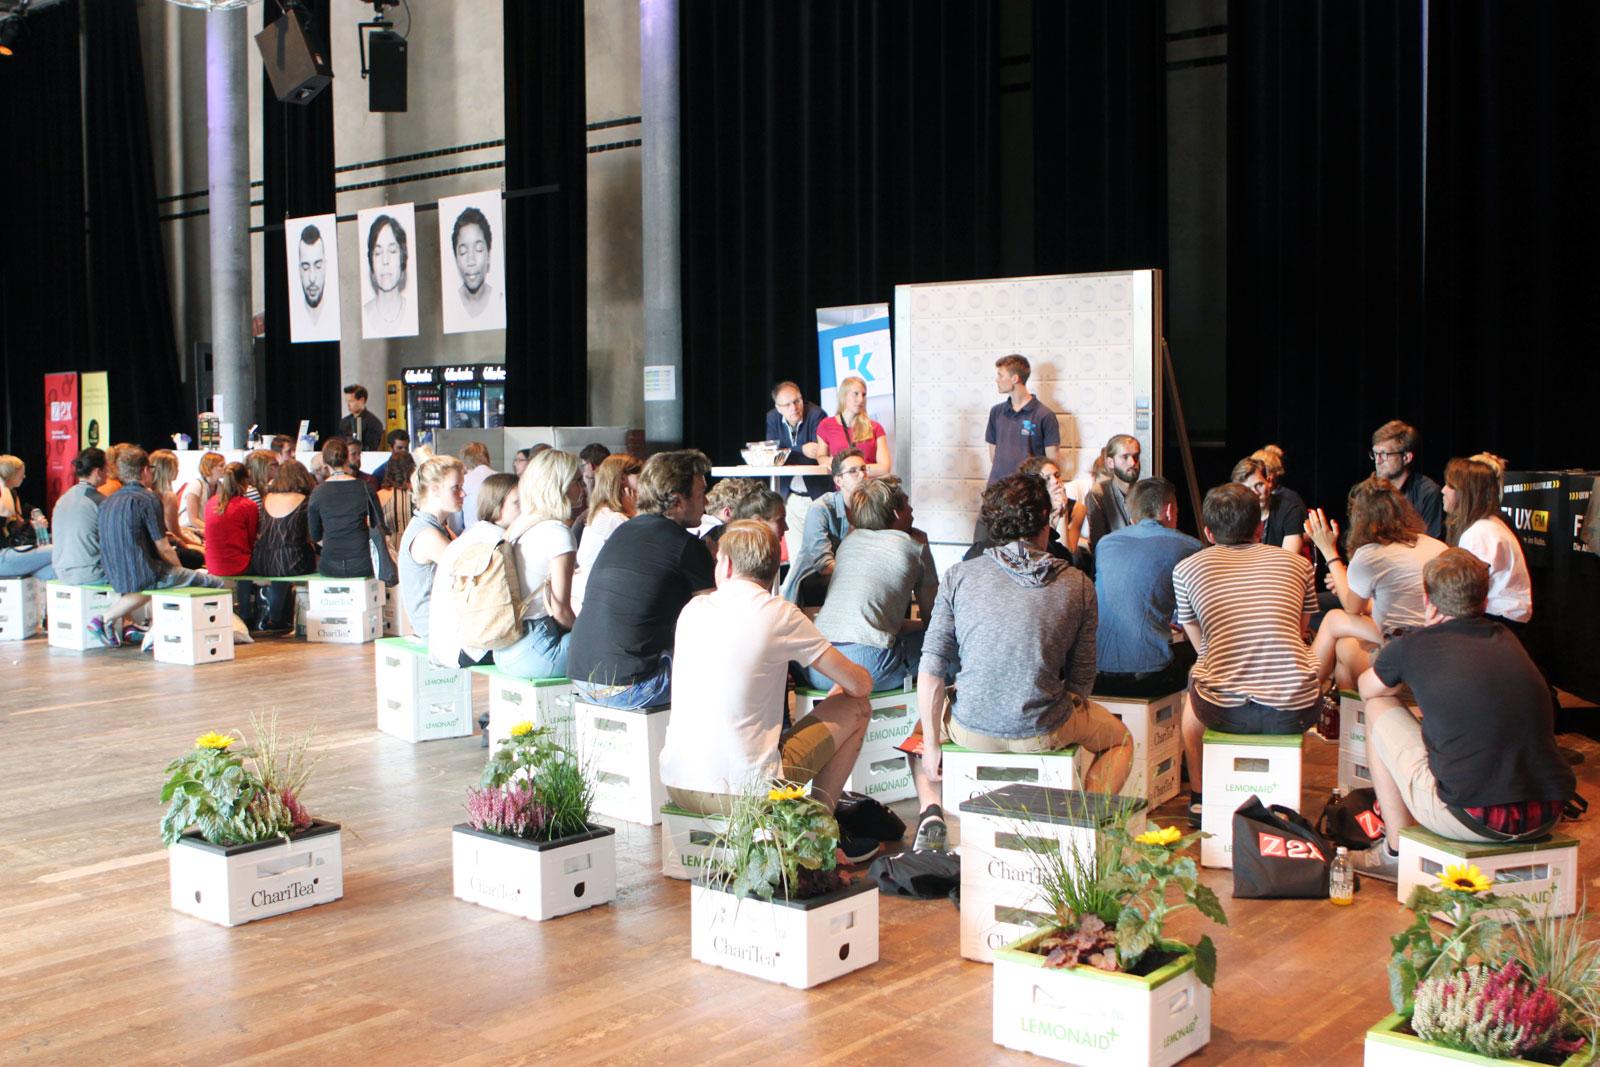 Im Radialsystem V in Berlin wurden rund 500 Teilnehmer begrüßt.